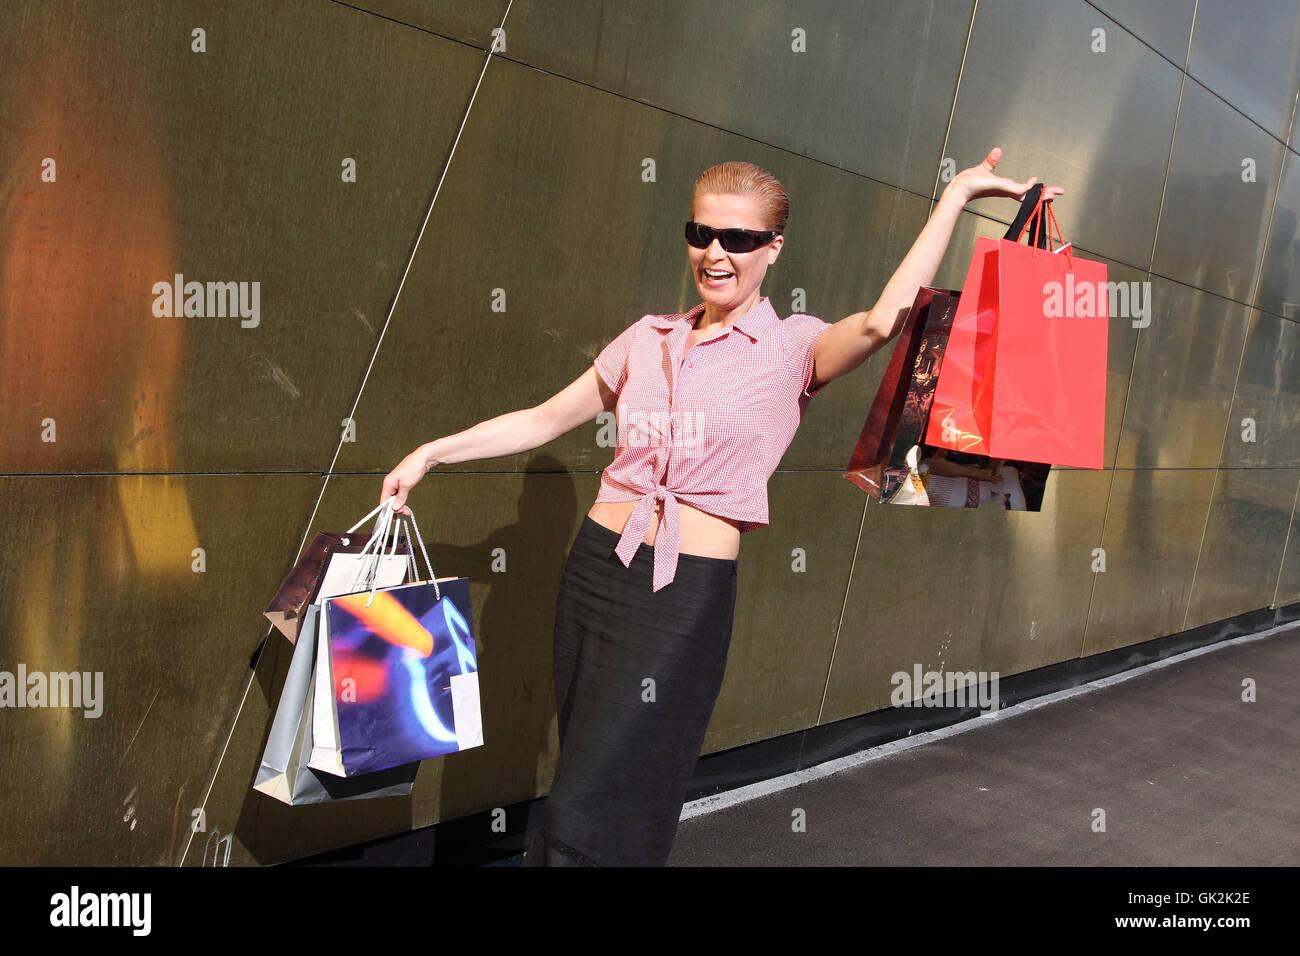 Compras Mujer comunicarse Imagen De Stock